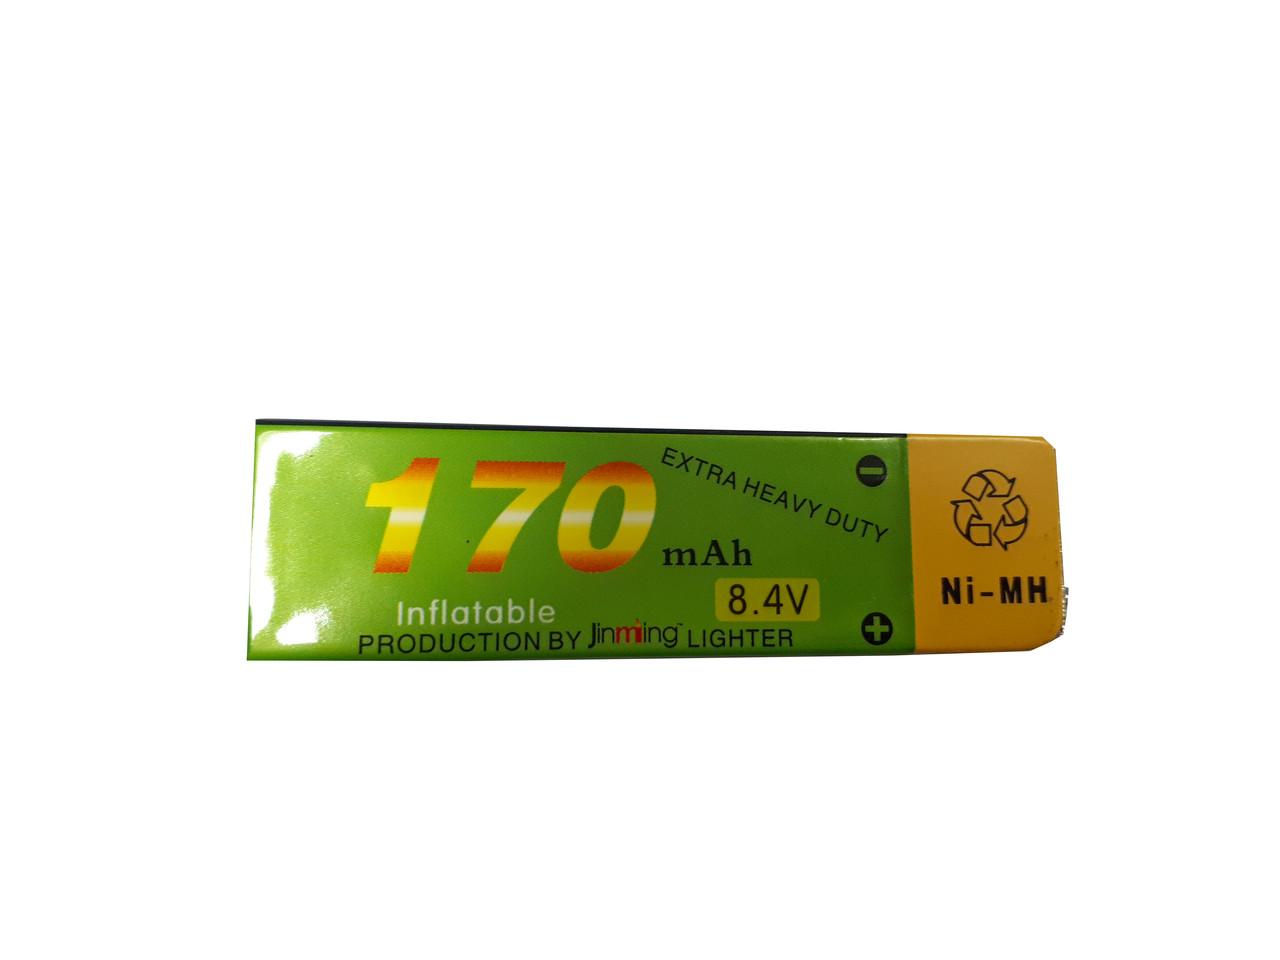 Зажигалке газовая Батарейка 170mAh